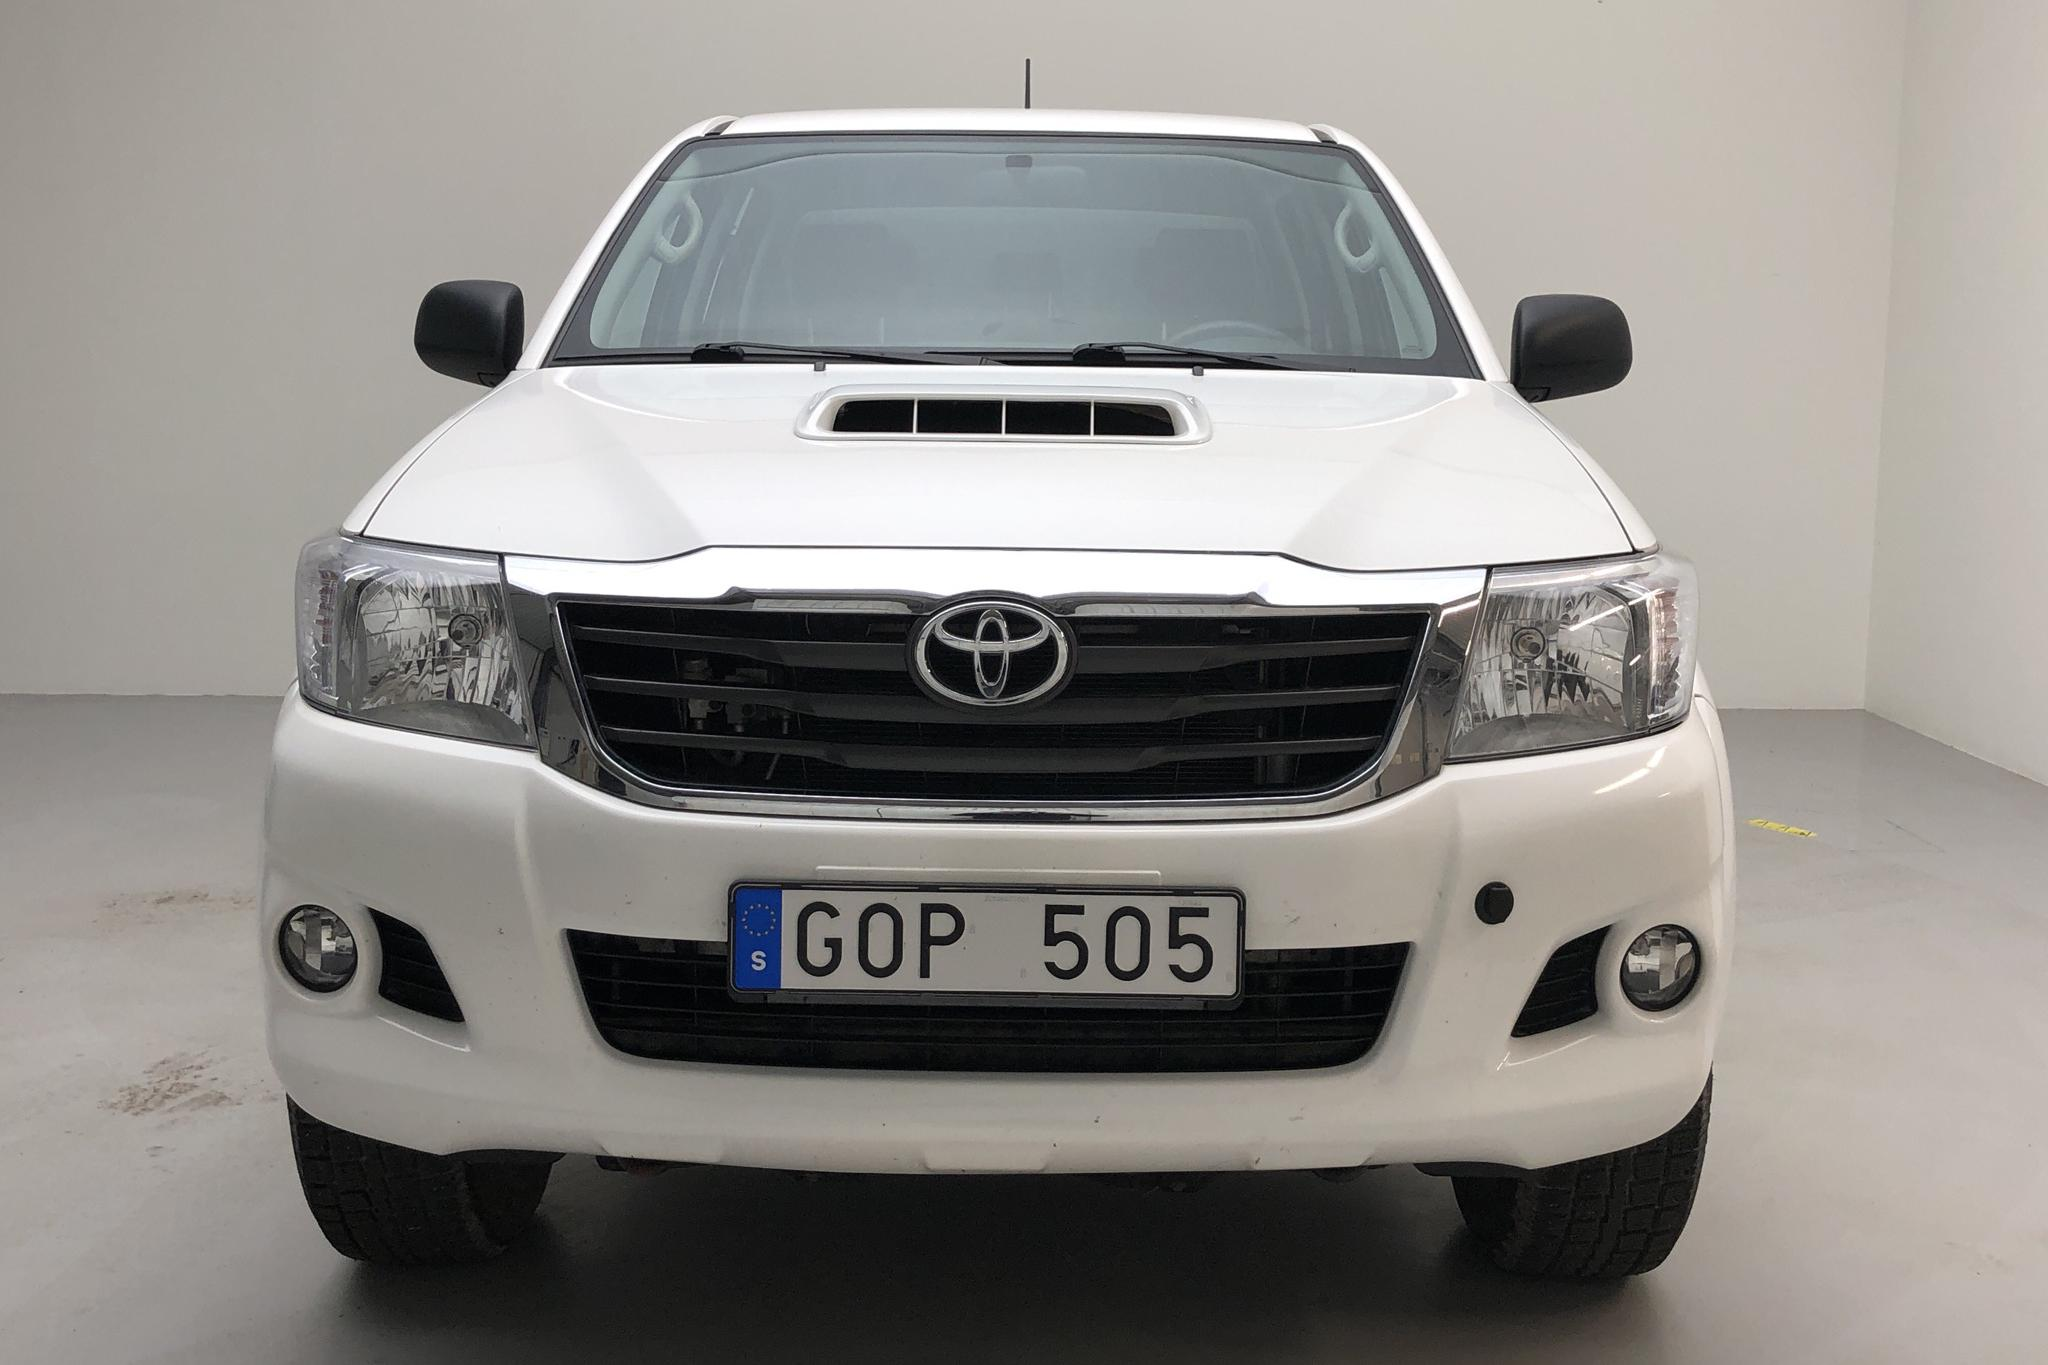 Toyota Hilux 2.5 D-4D 4WD (144hk) - 73 260 km - Manual - white - 2013